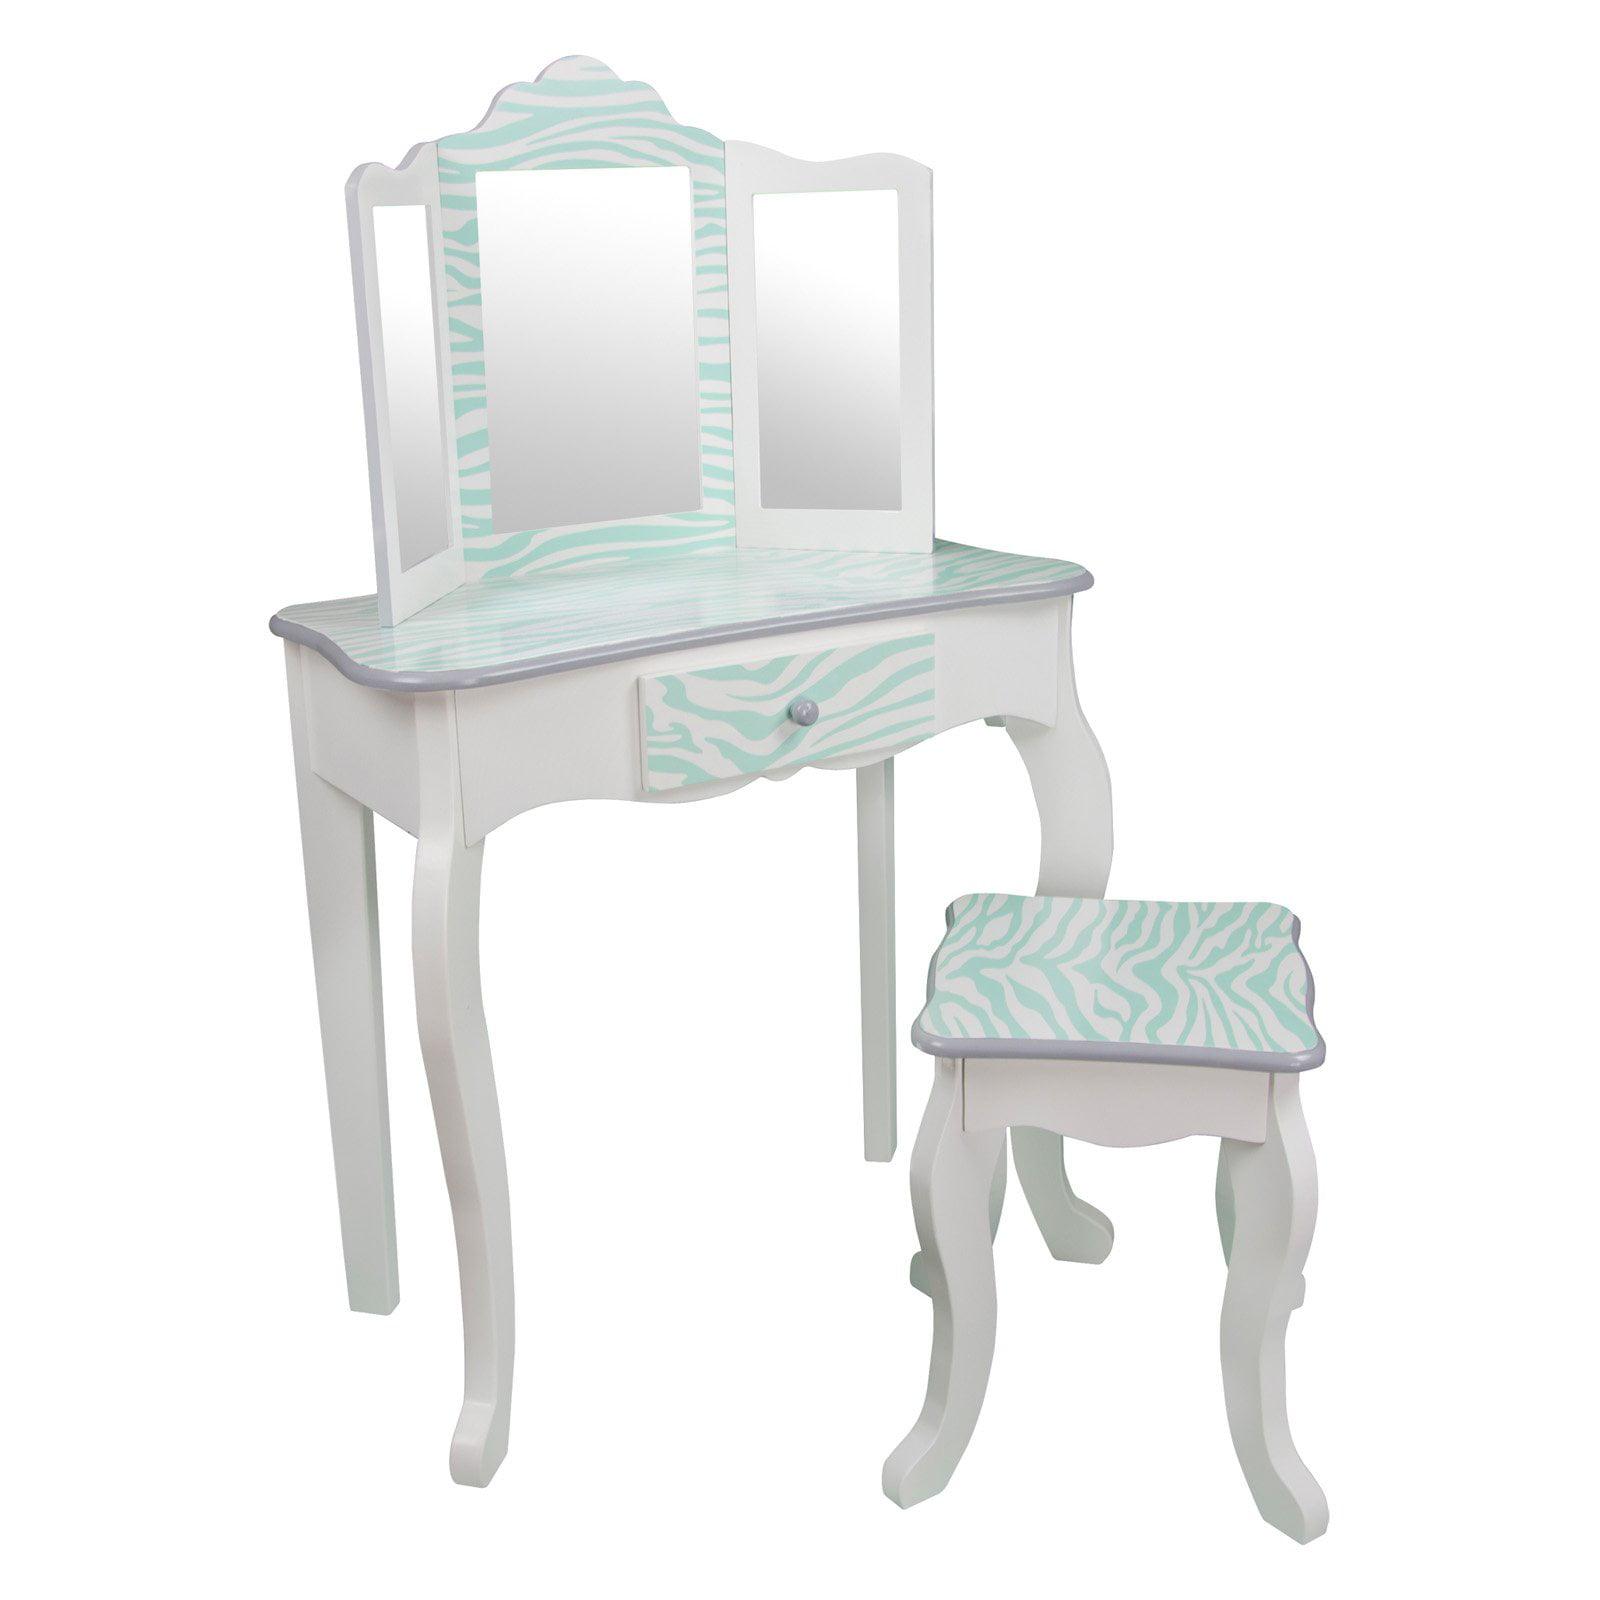 Teamson Kids Fashion Prints Vanity Table And Stool Set With Mirror Zebra Aqua Blue White